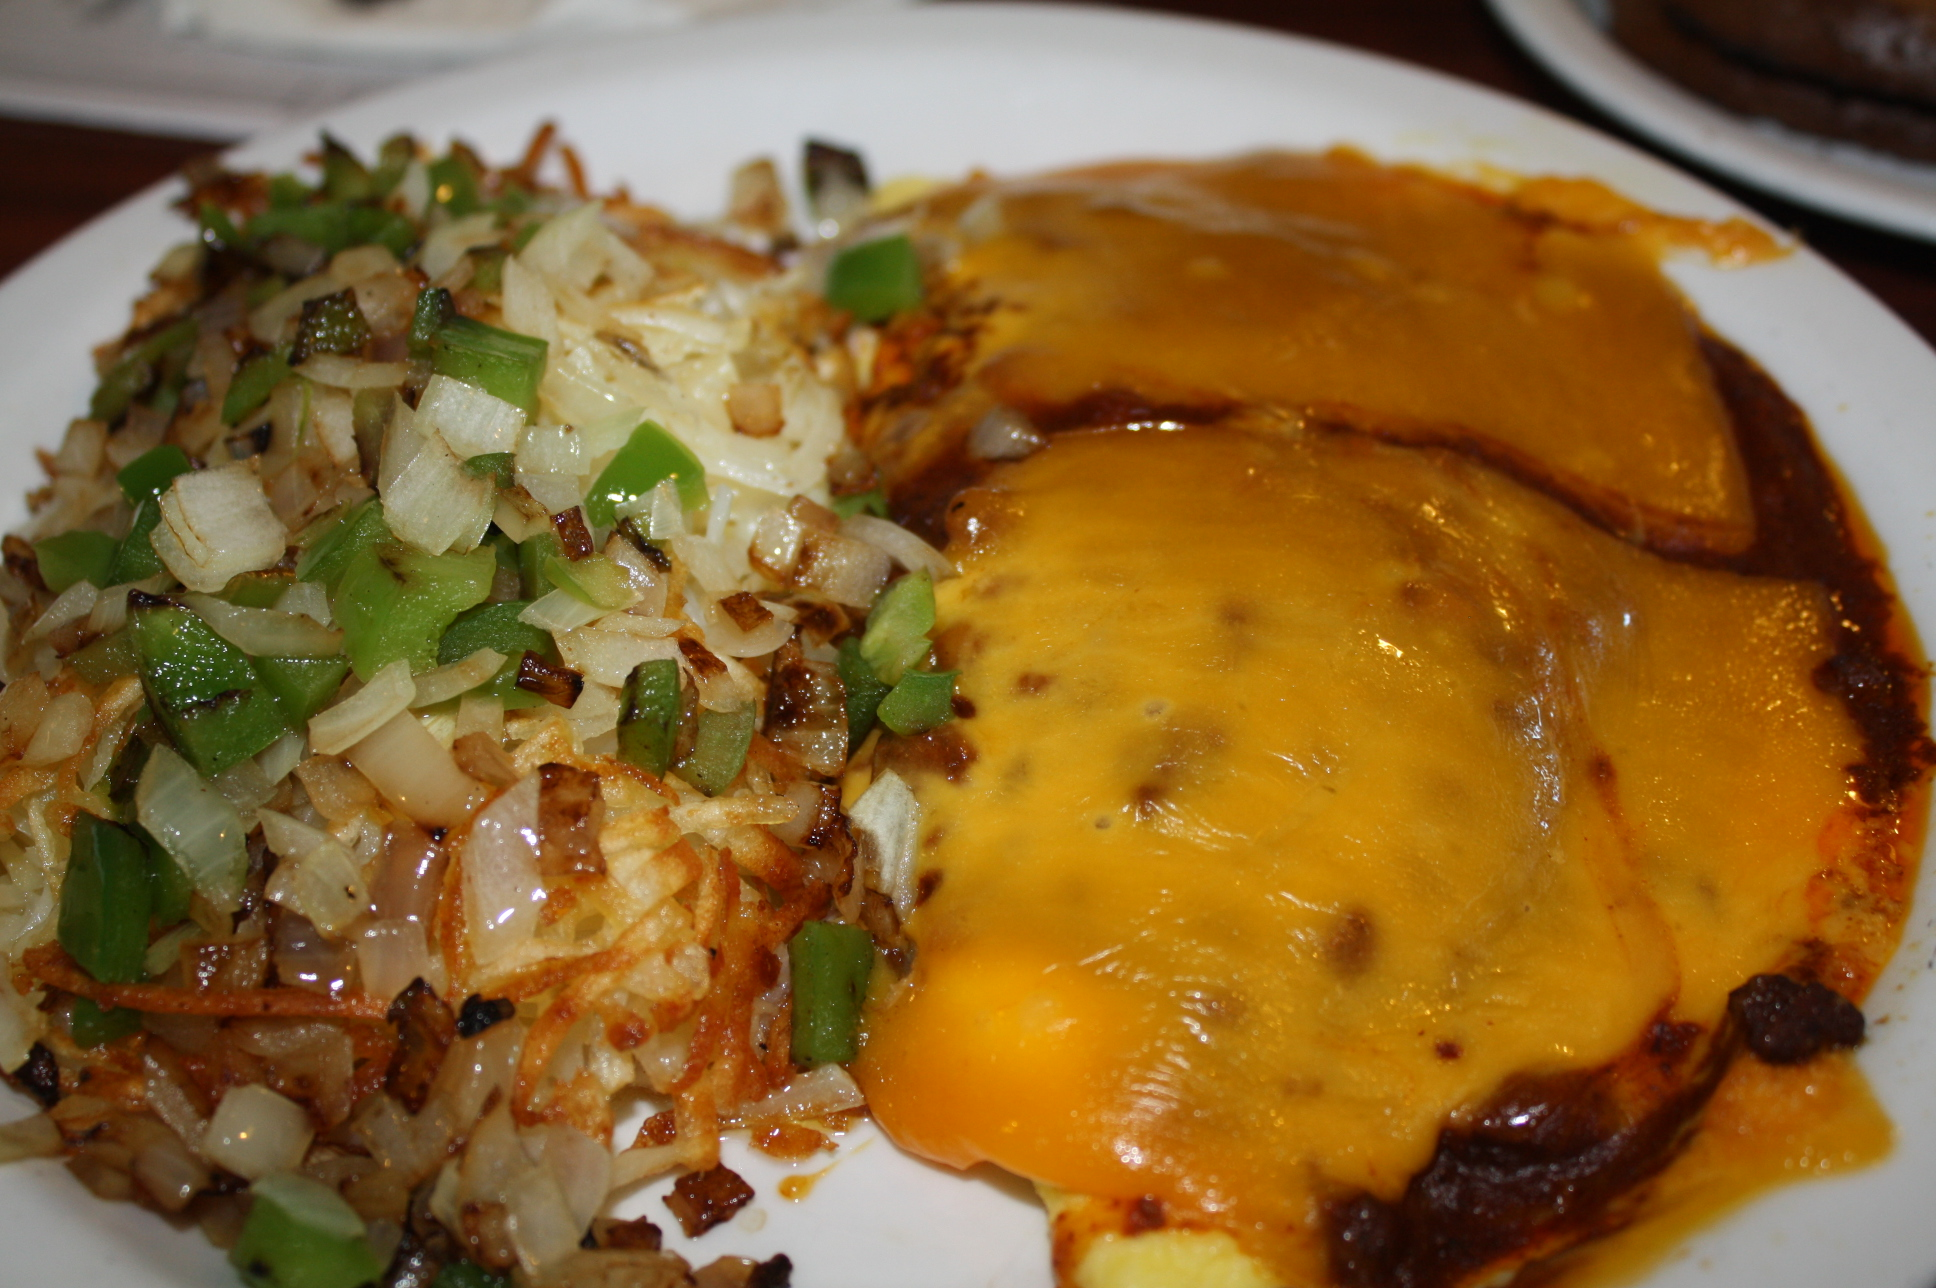 Chili & Cheese Omelette. (Foto de Agustín Durán/El Pasajero).